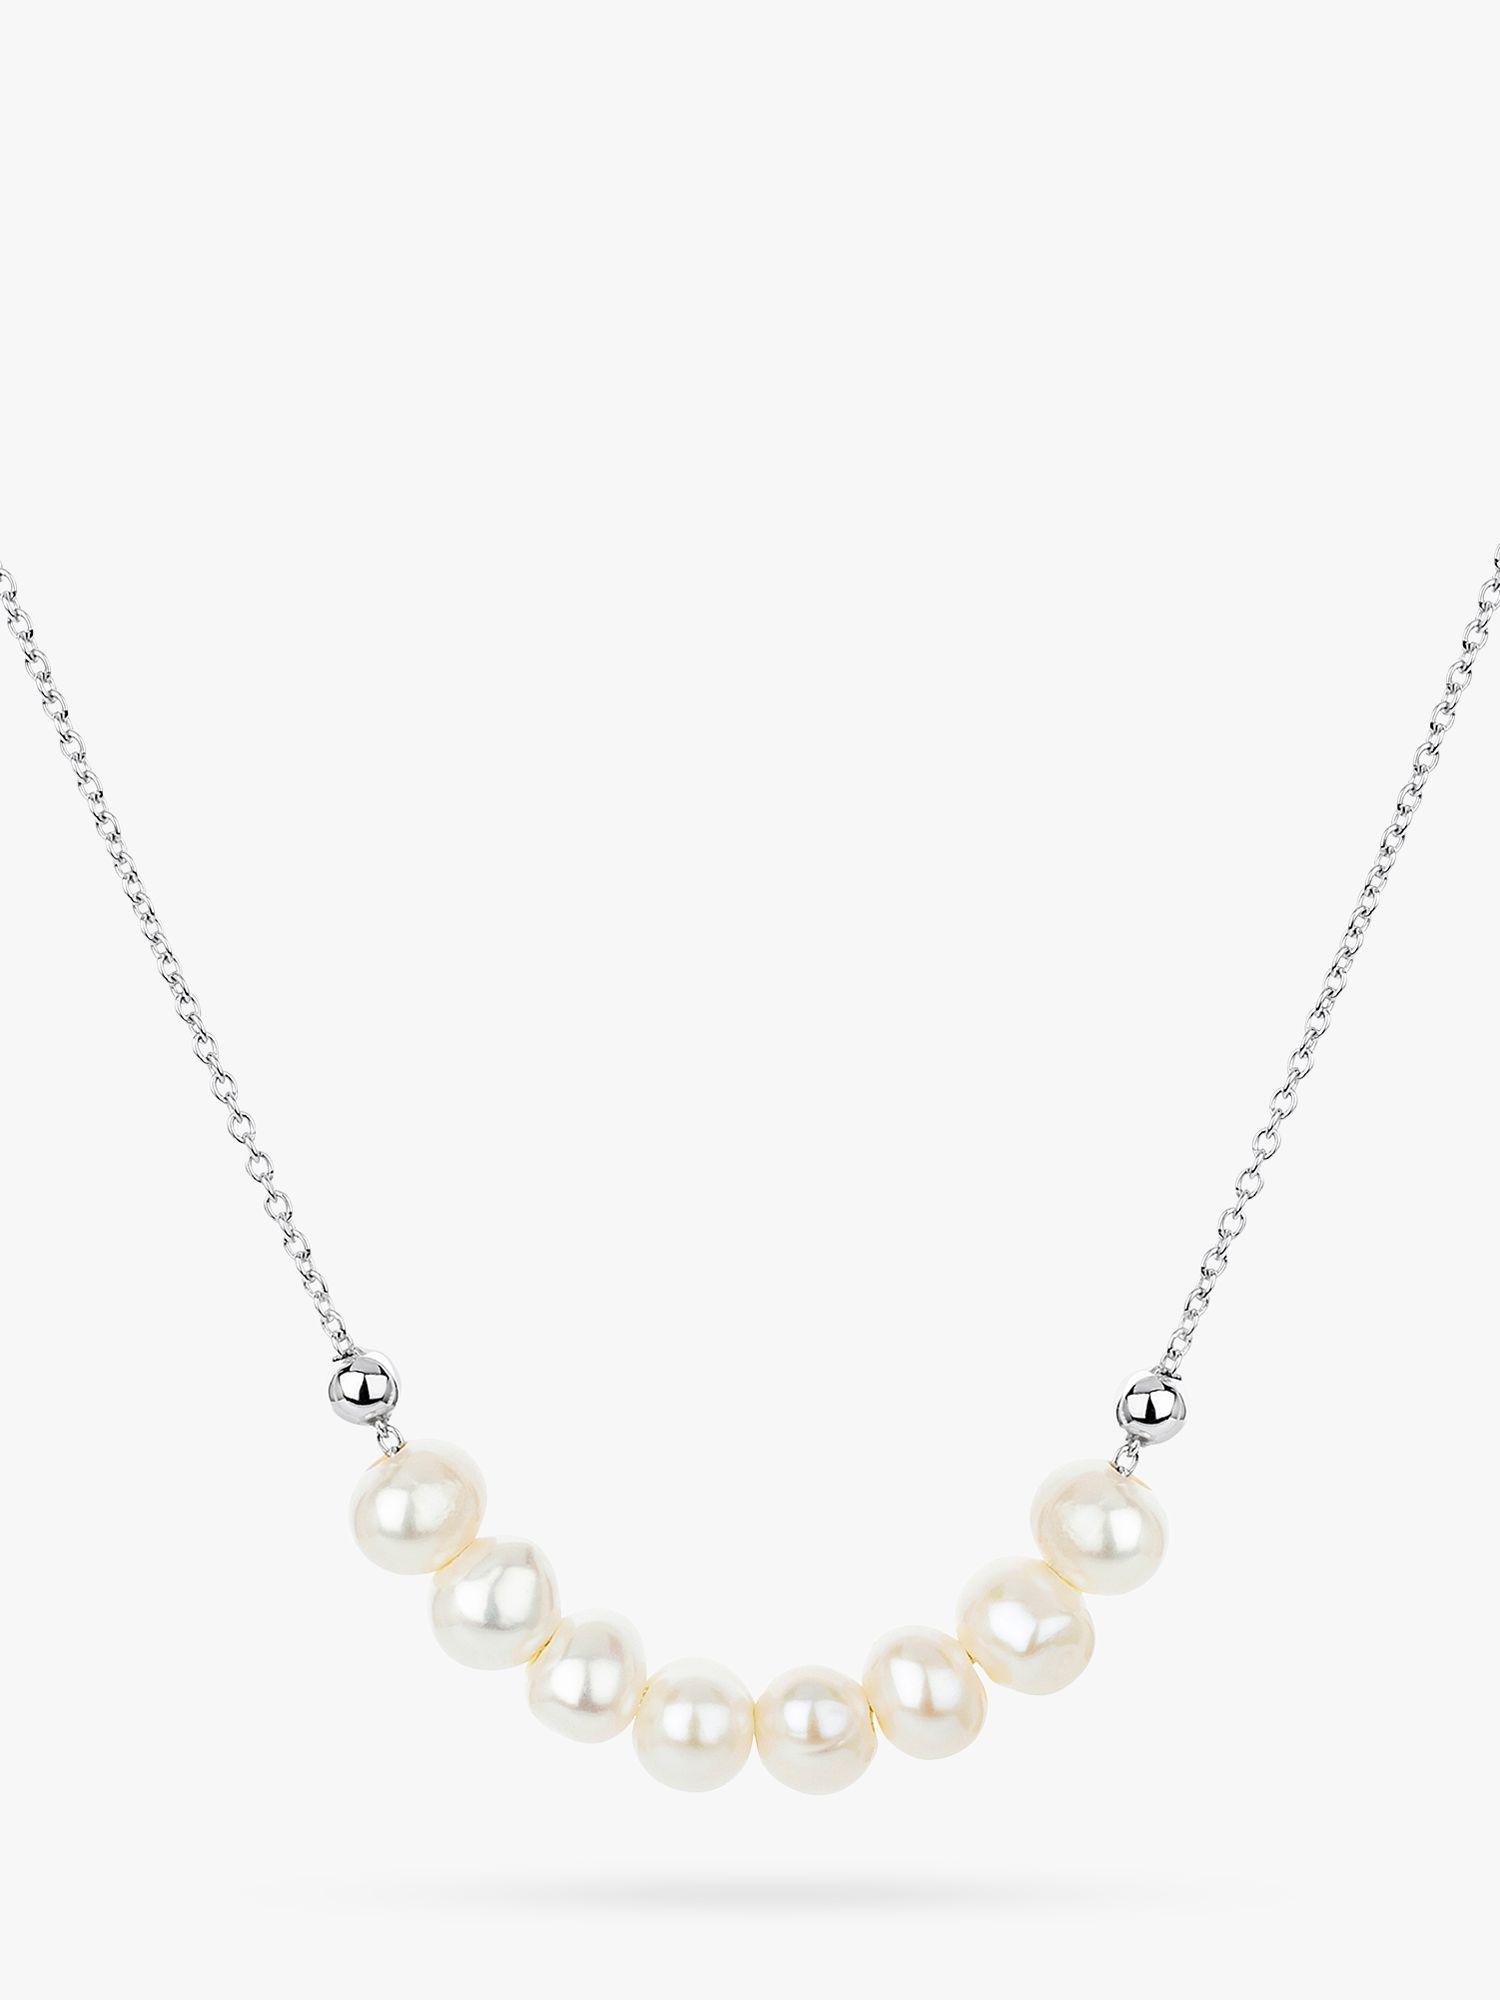 Claudia Bradby Claudia Bradby Angelina Pearl Collar Necklace, Silver